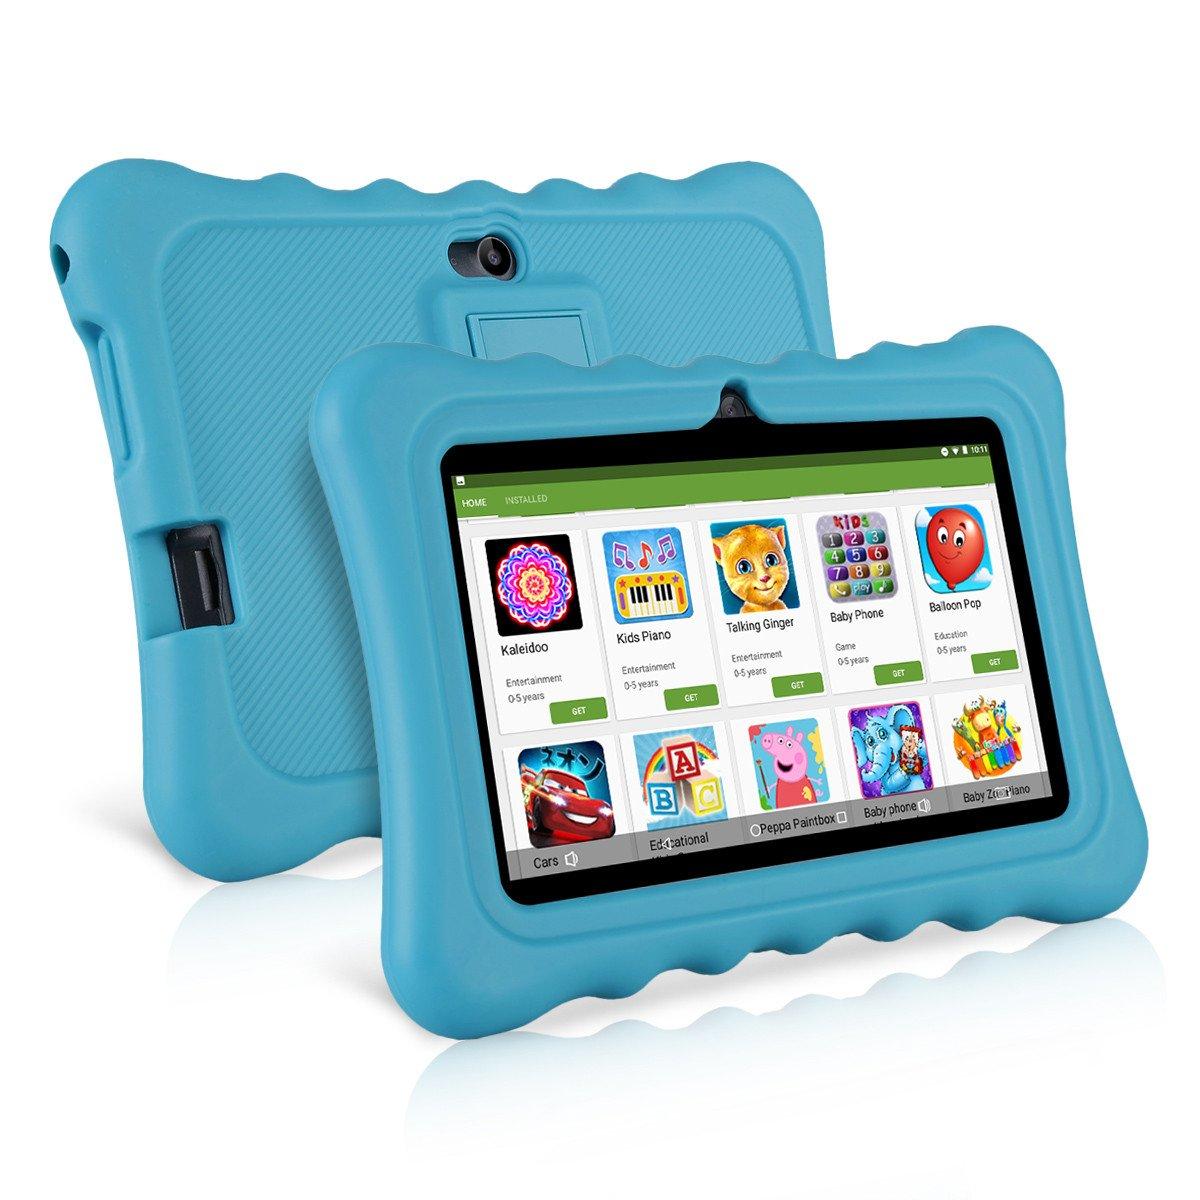 Ainol Q88 Android 7.1 RK3126C Quad Core 1GB+16GB 0.3MP+0.3MP Cam WiFi 2800Ah Tablet PC (Blue)